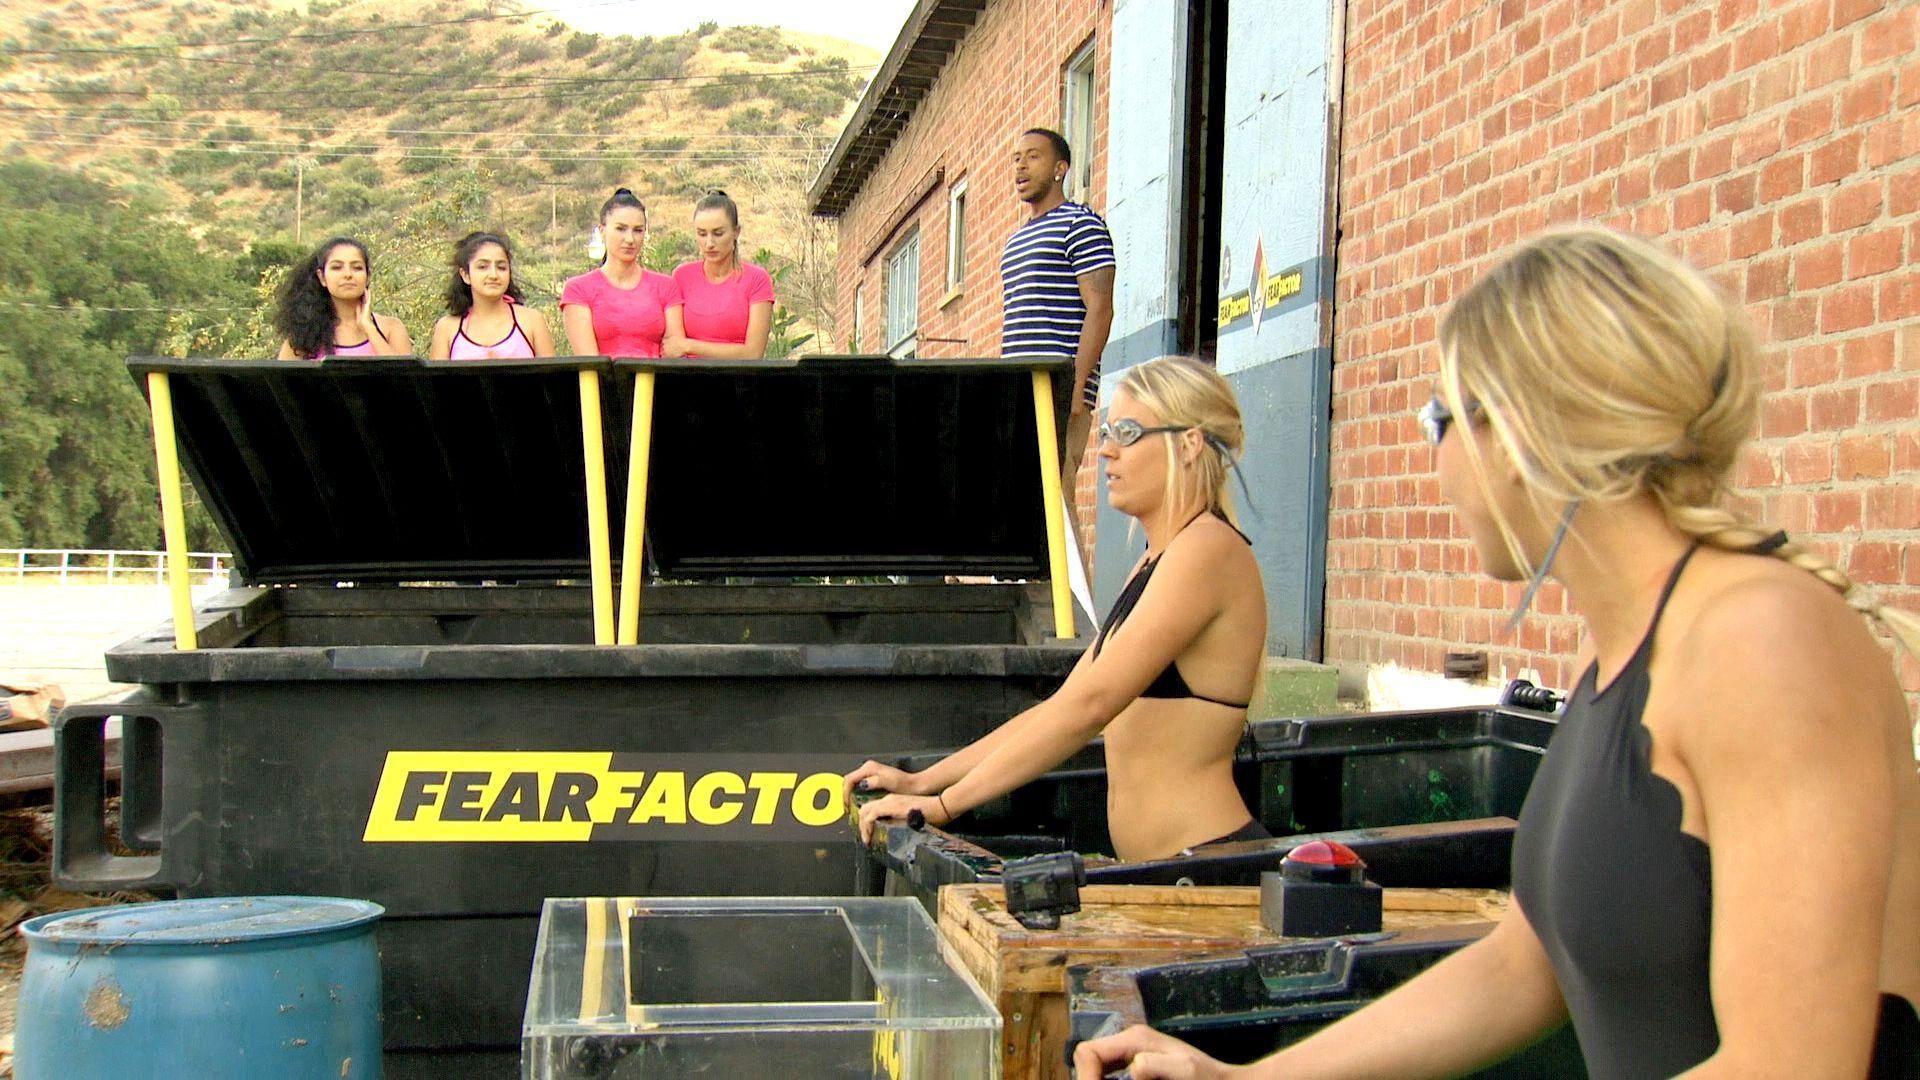 Fear factor boobs — 6